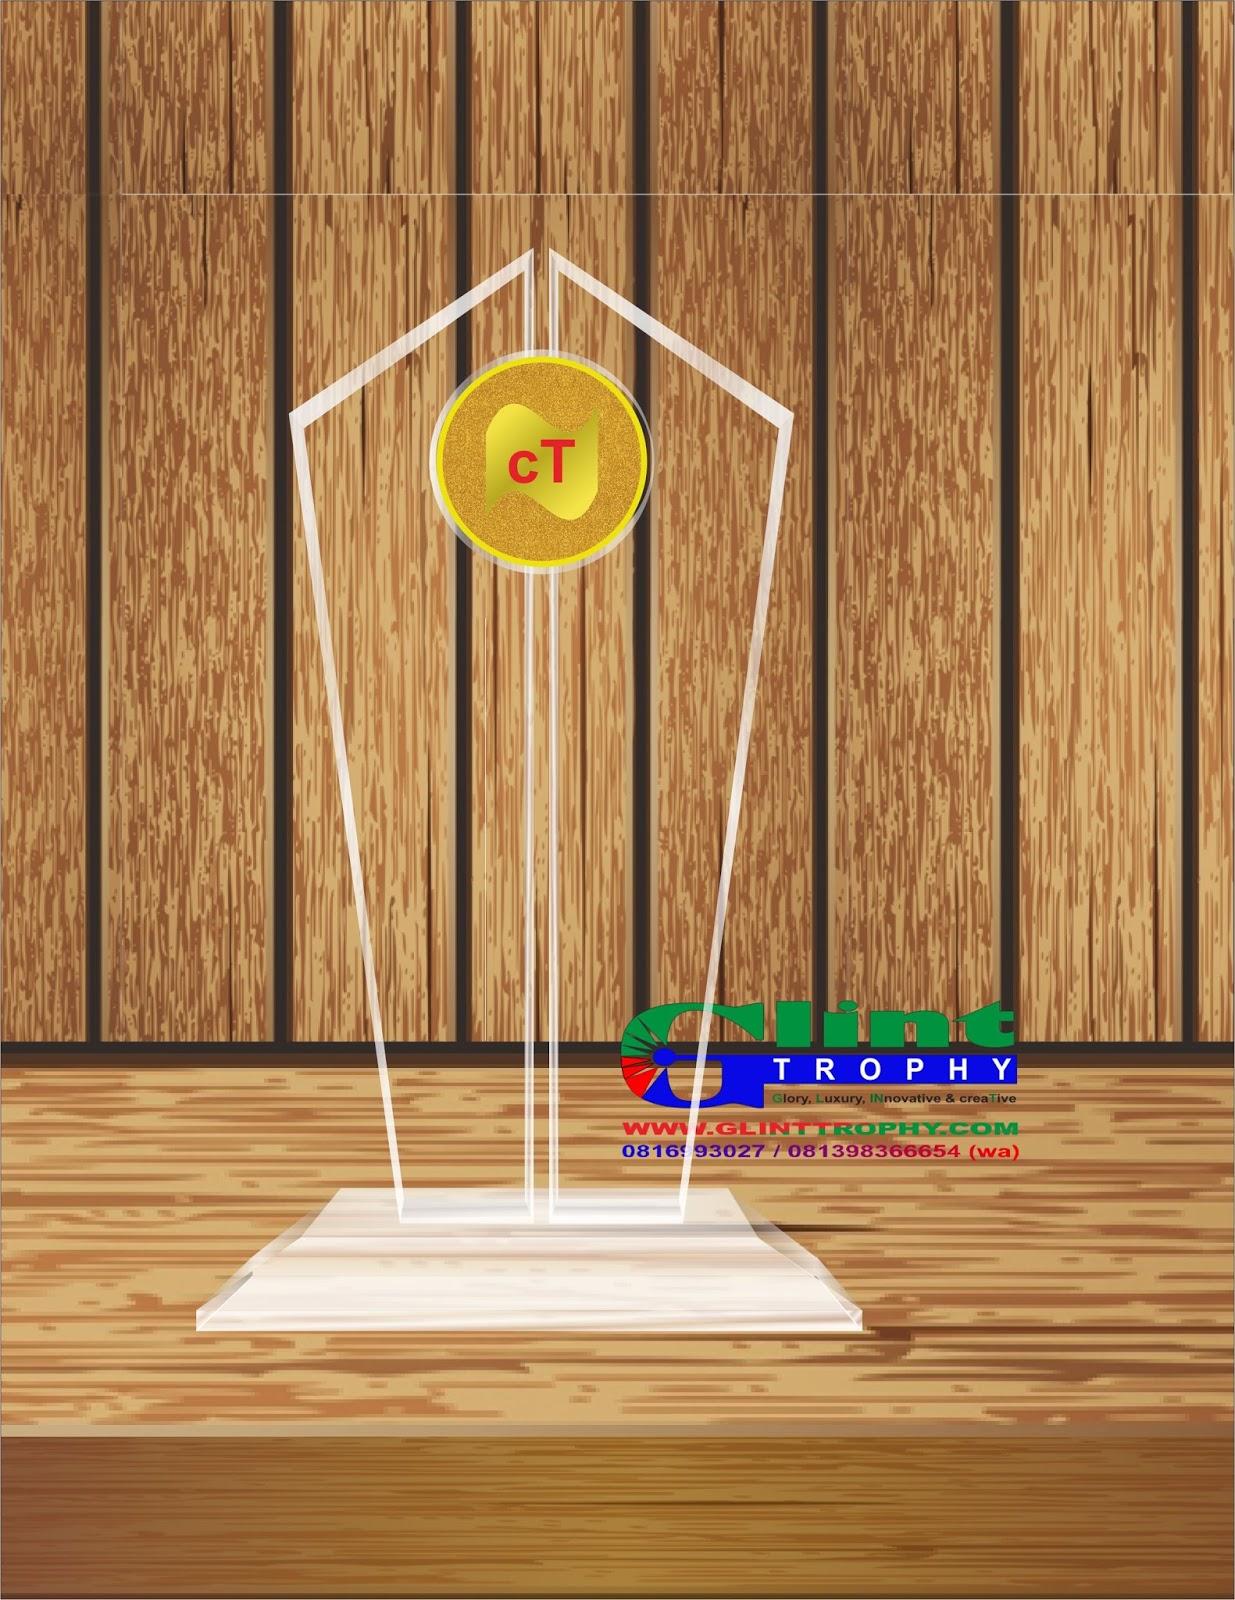 Glint Trophy Pusat Dan Tempat Pembuatan Penjualan Pemesanan Plakat Fiber  Berkualitas Contoh Desain Piala Award Dari Akrilik Punya Sendiri Jangan Ragu Untuk Kirim Ke Kami Di Sales